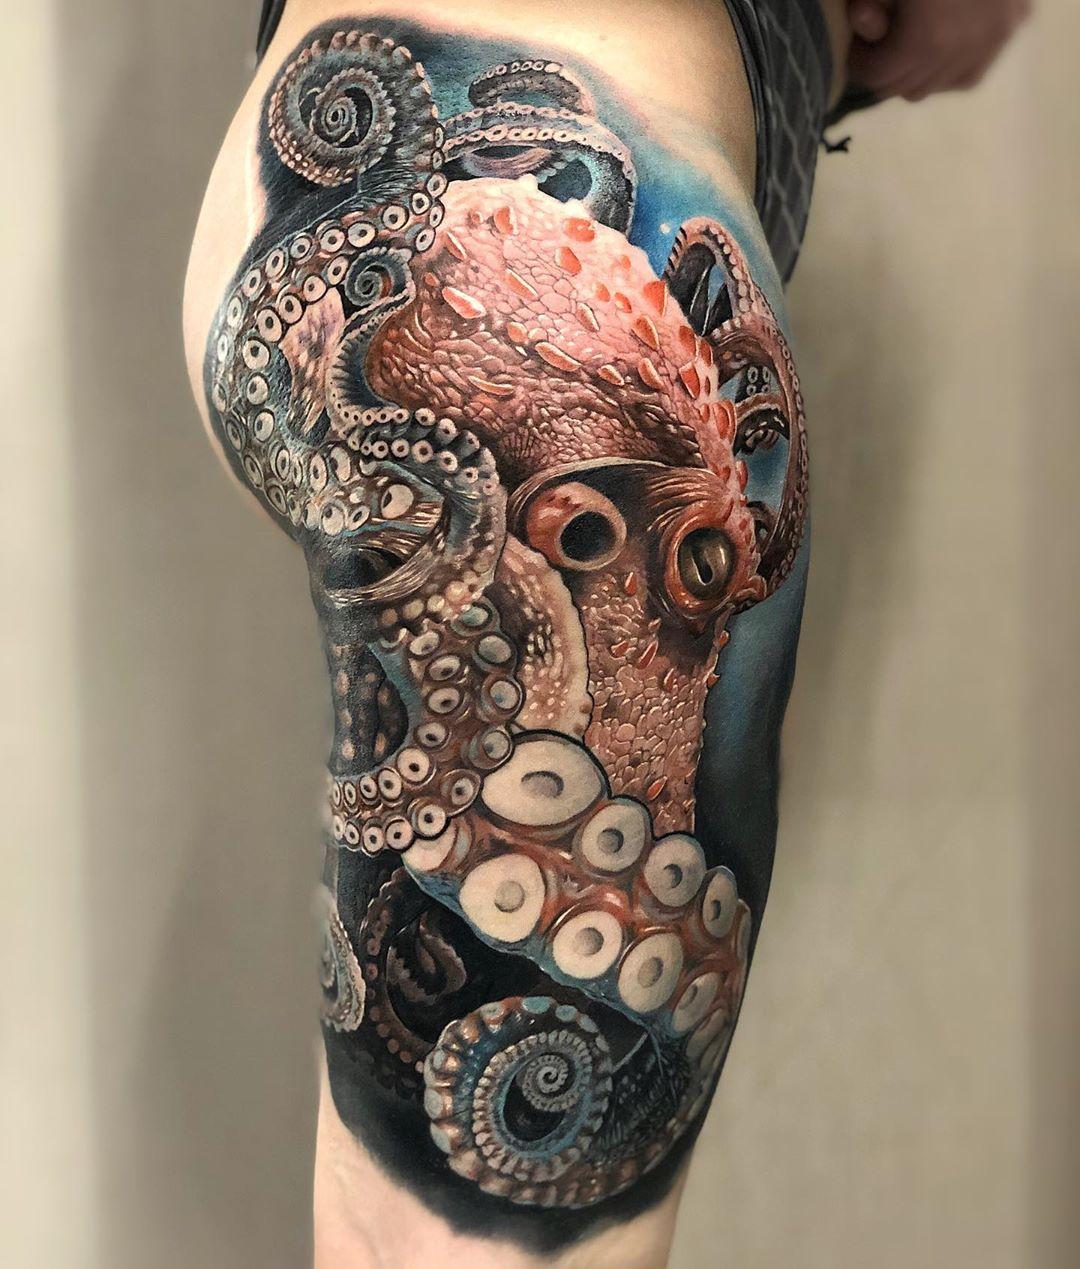 Octopus on woman's hip